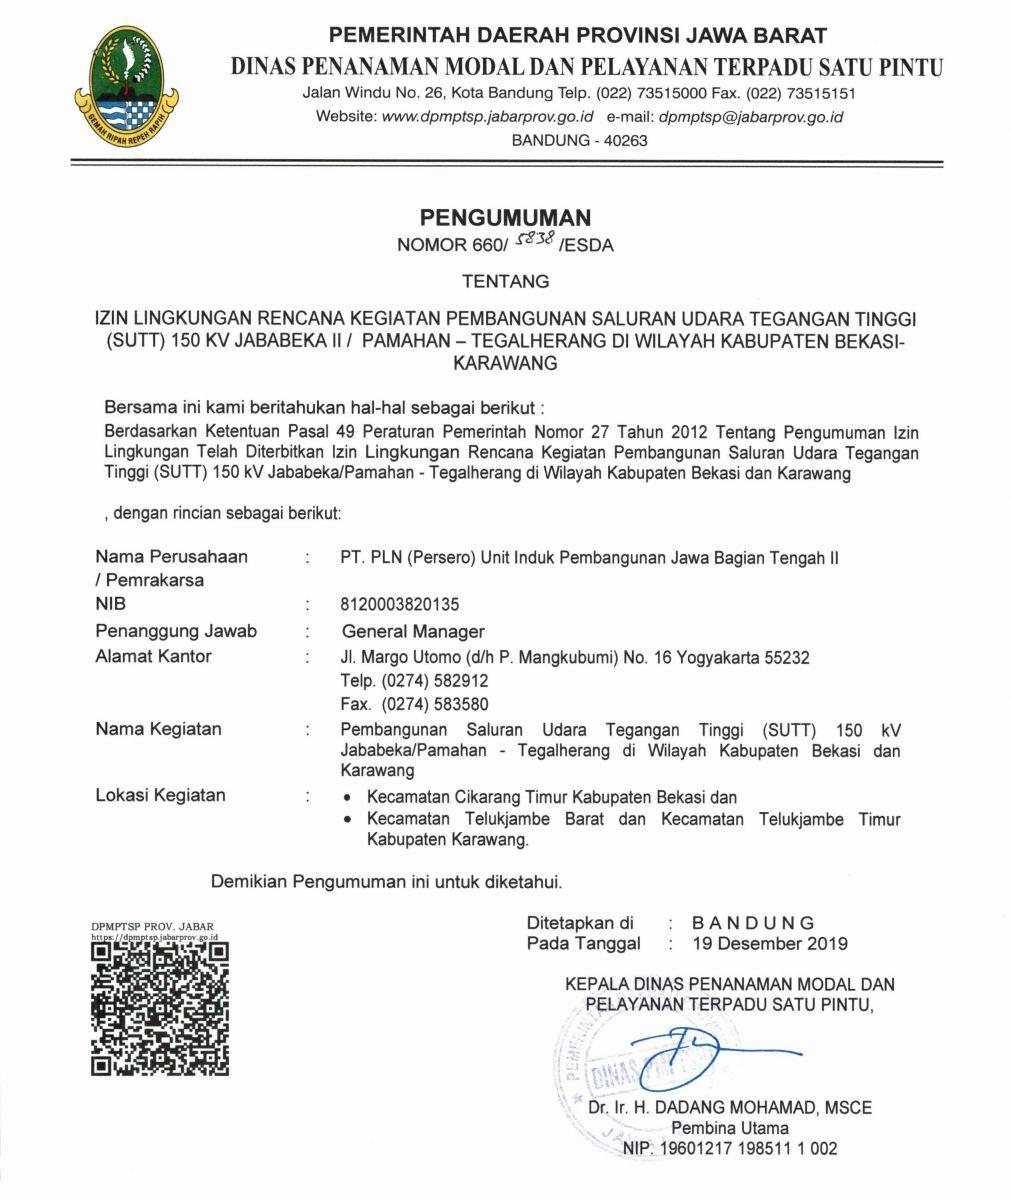 Pengumuman Izin Lingkungan PT. PLN (Persero) Unit Induk Pembangunan Jawa Tengah II